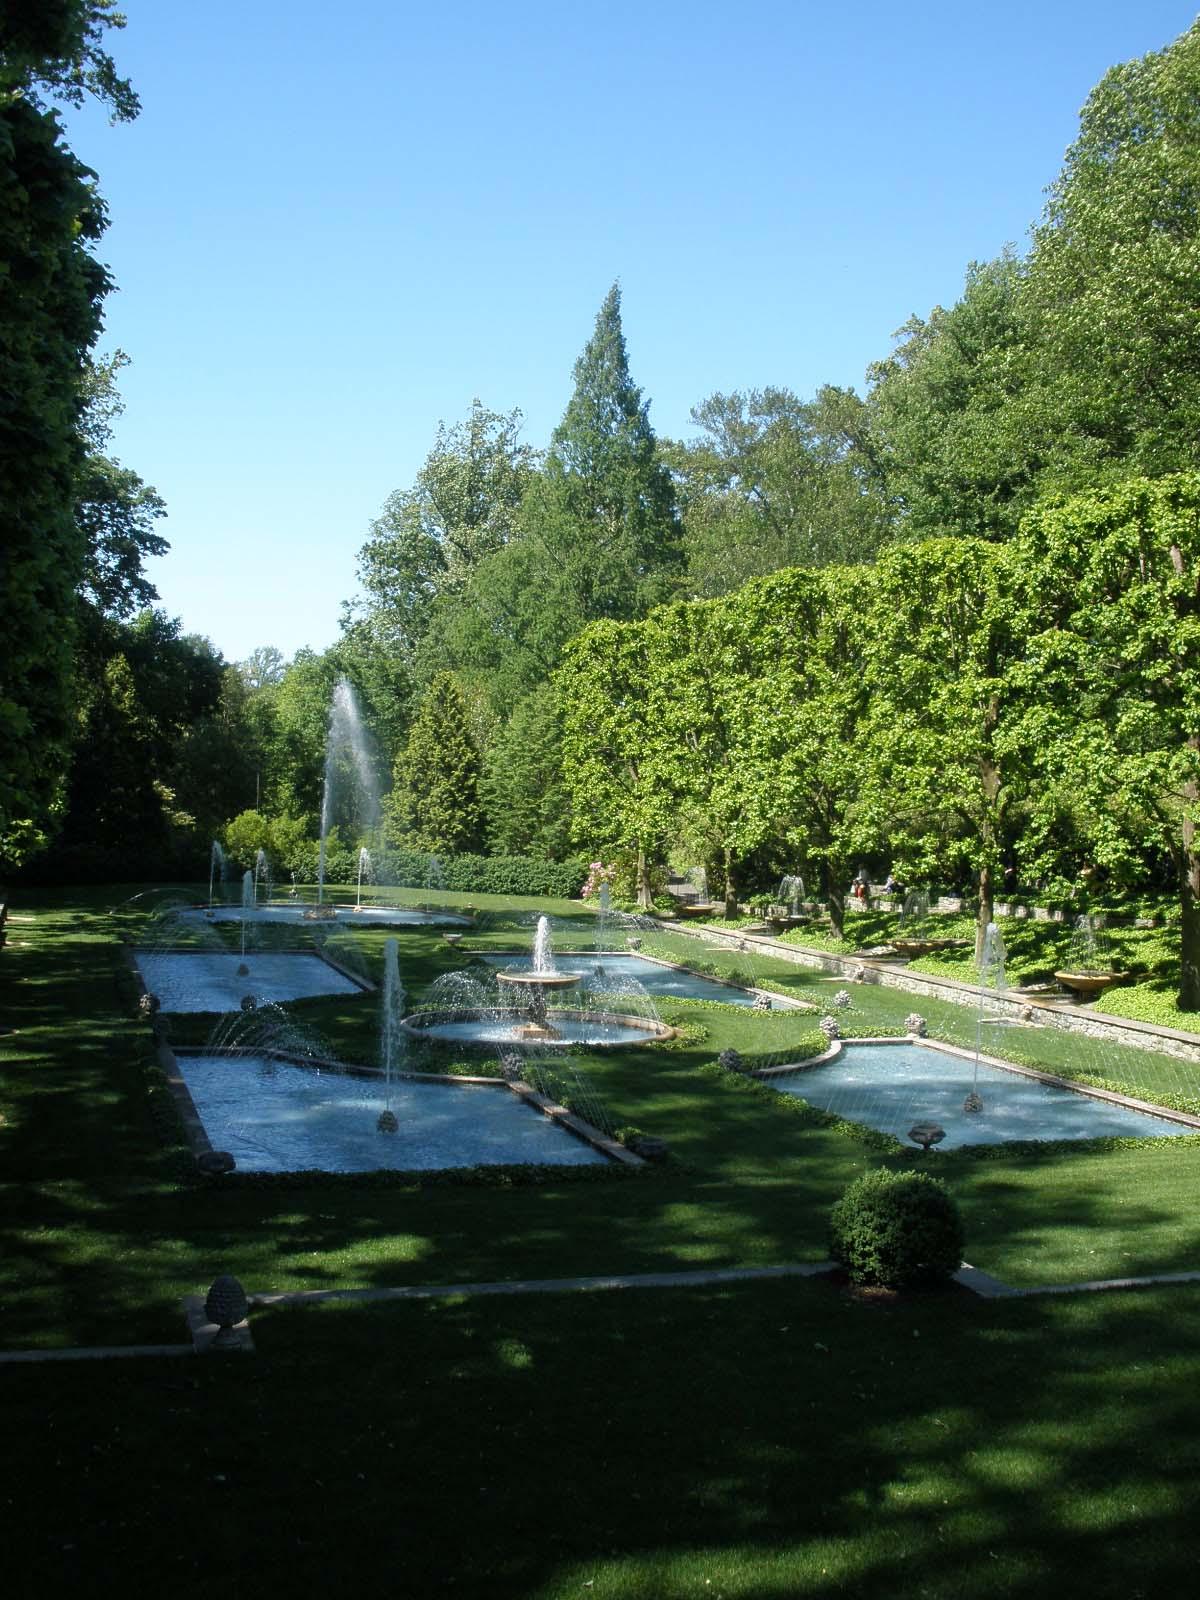 Pictures Of Garden Pathways And Walkways: Picture Of Elegance Blog: Longwood Gardens